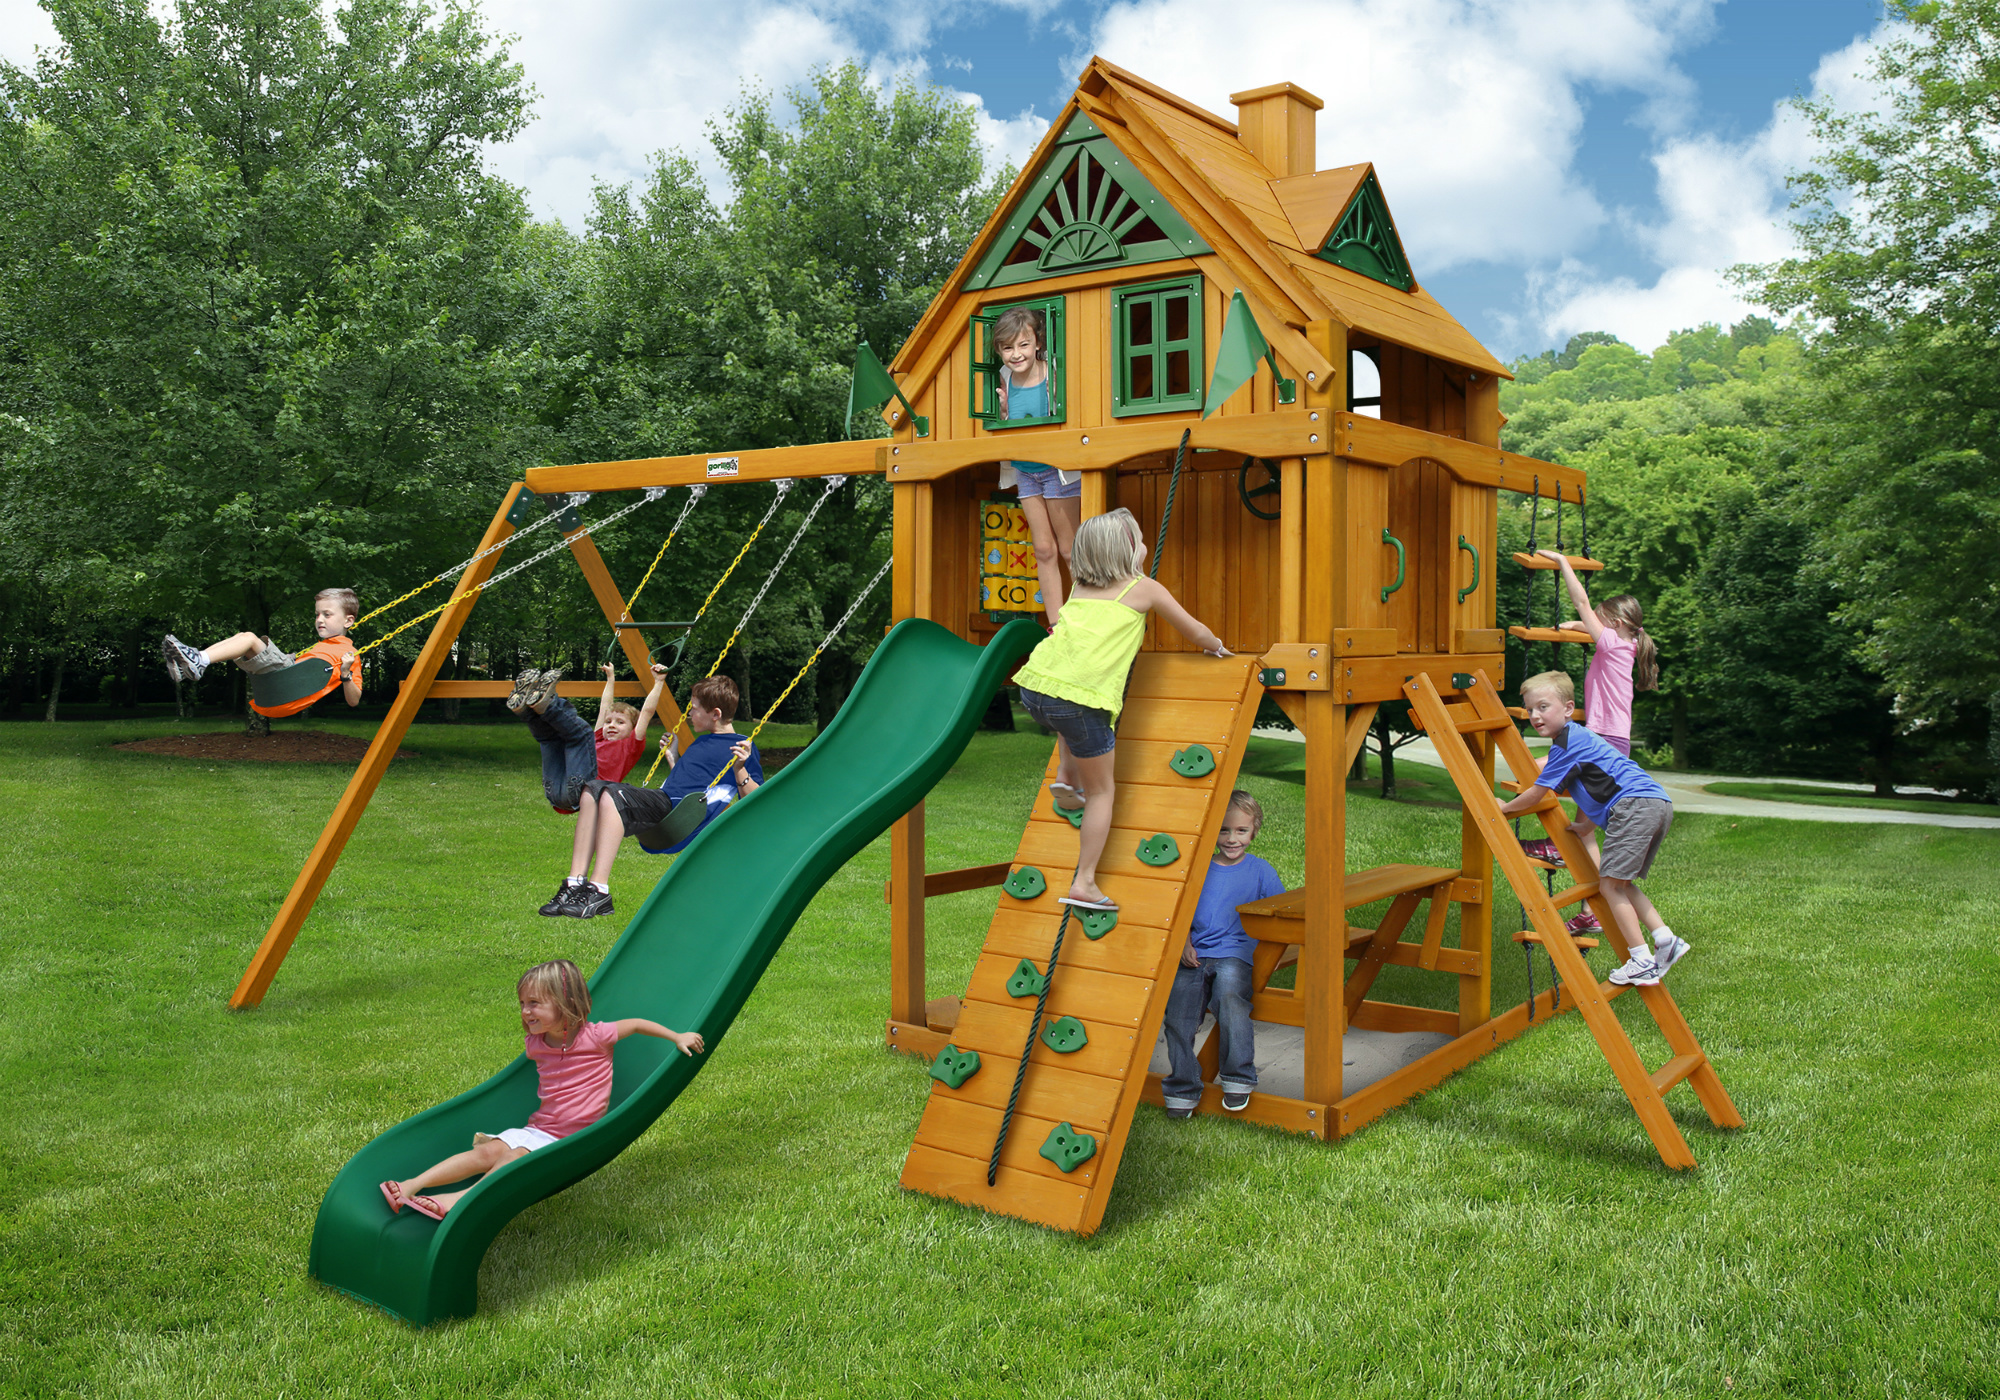 Discount Playground Supply image 1